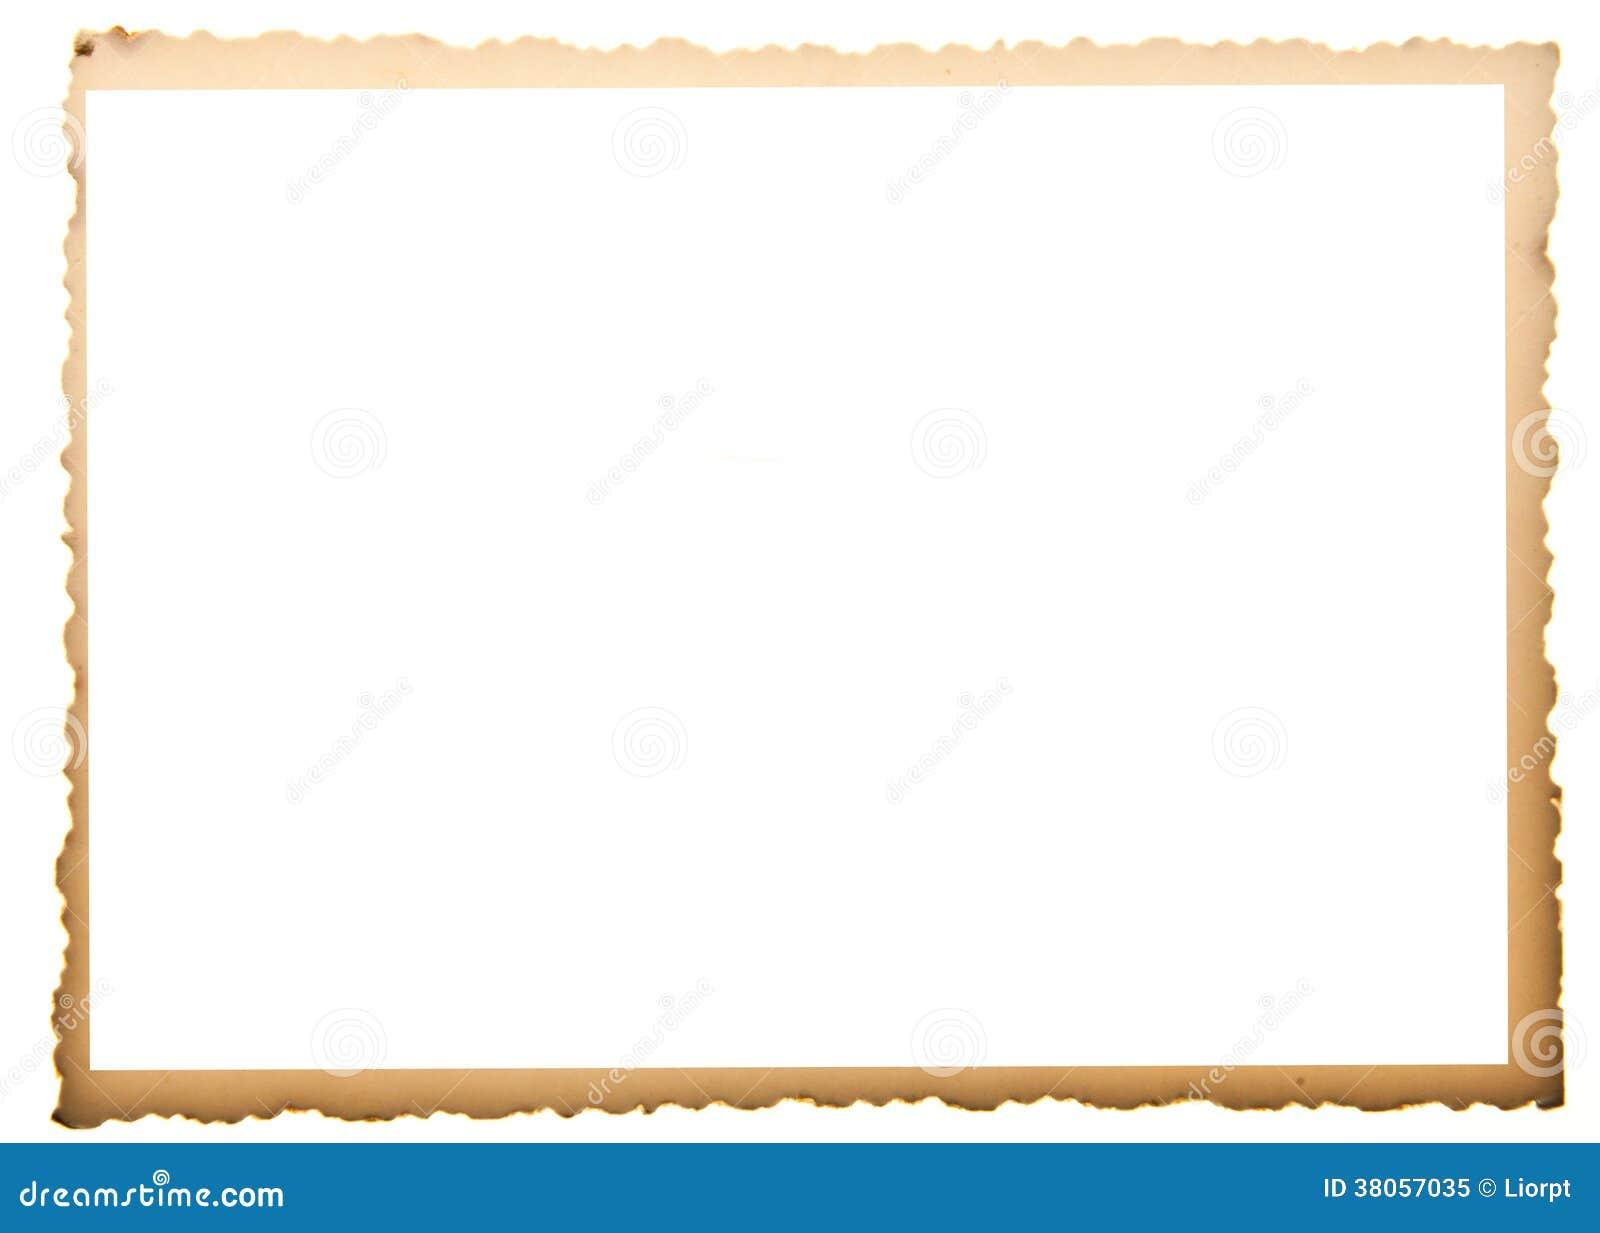 Alter Fotorahmen stockbild. Bild von papier, horizontal - 38057035